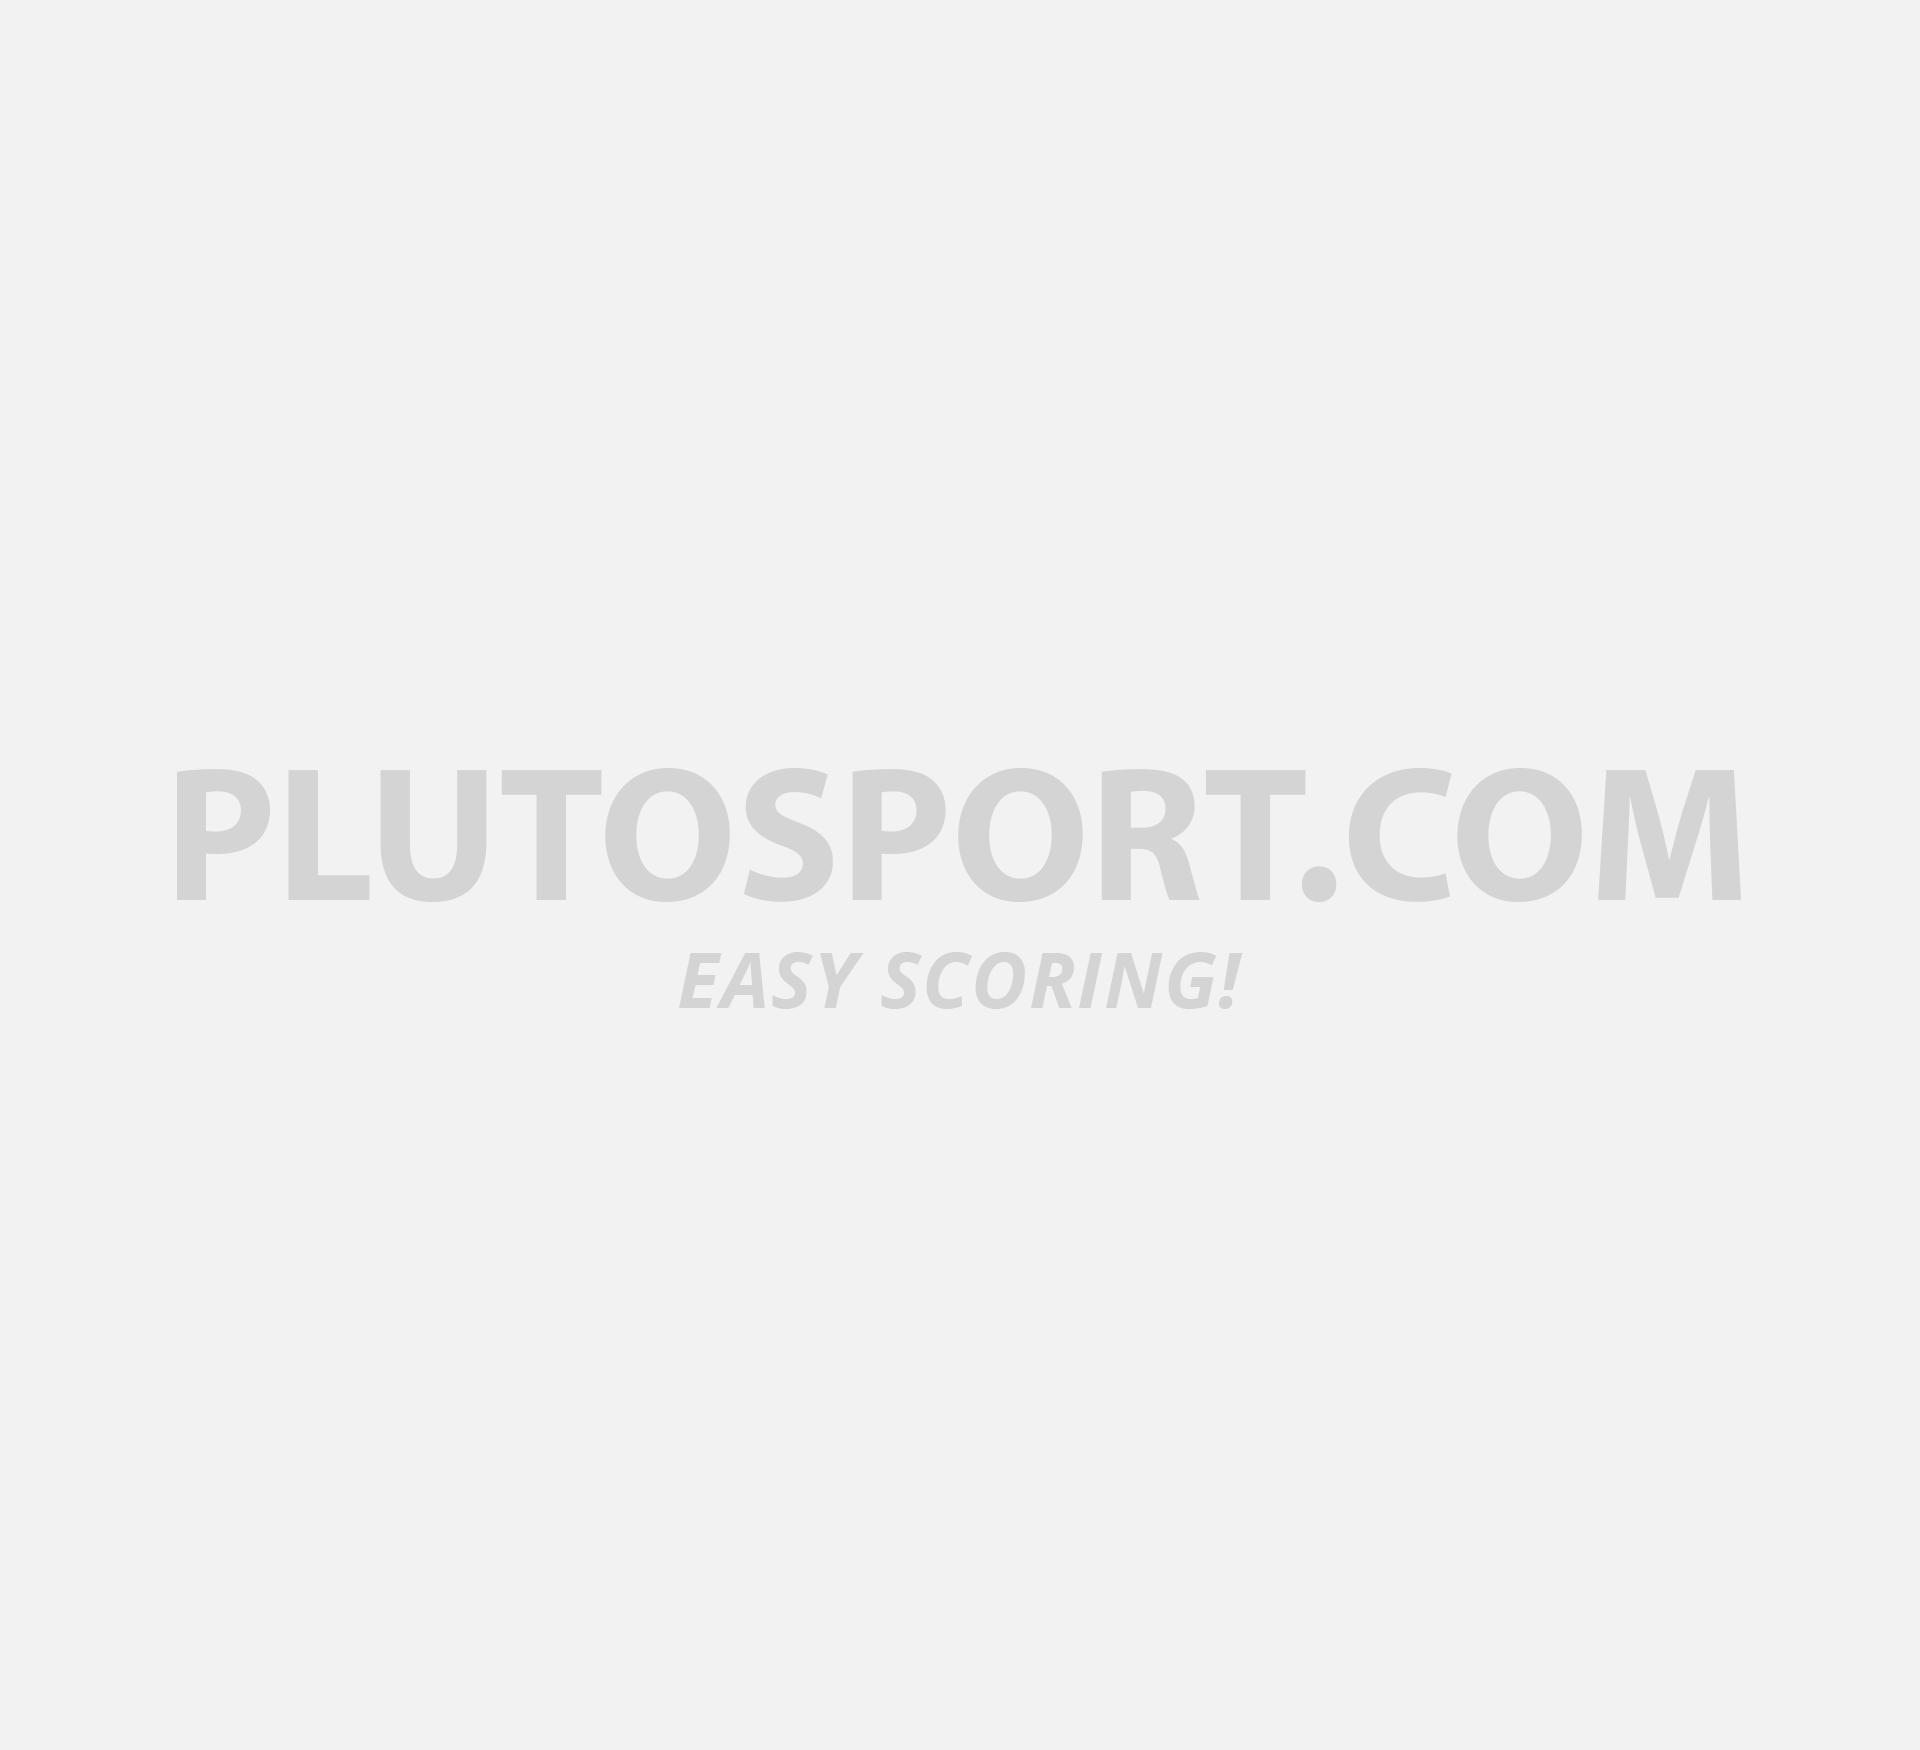 adidas zx flux 750